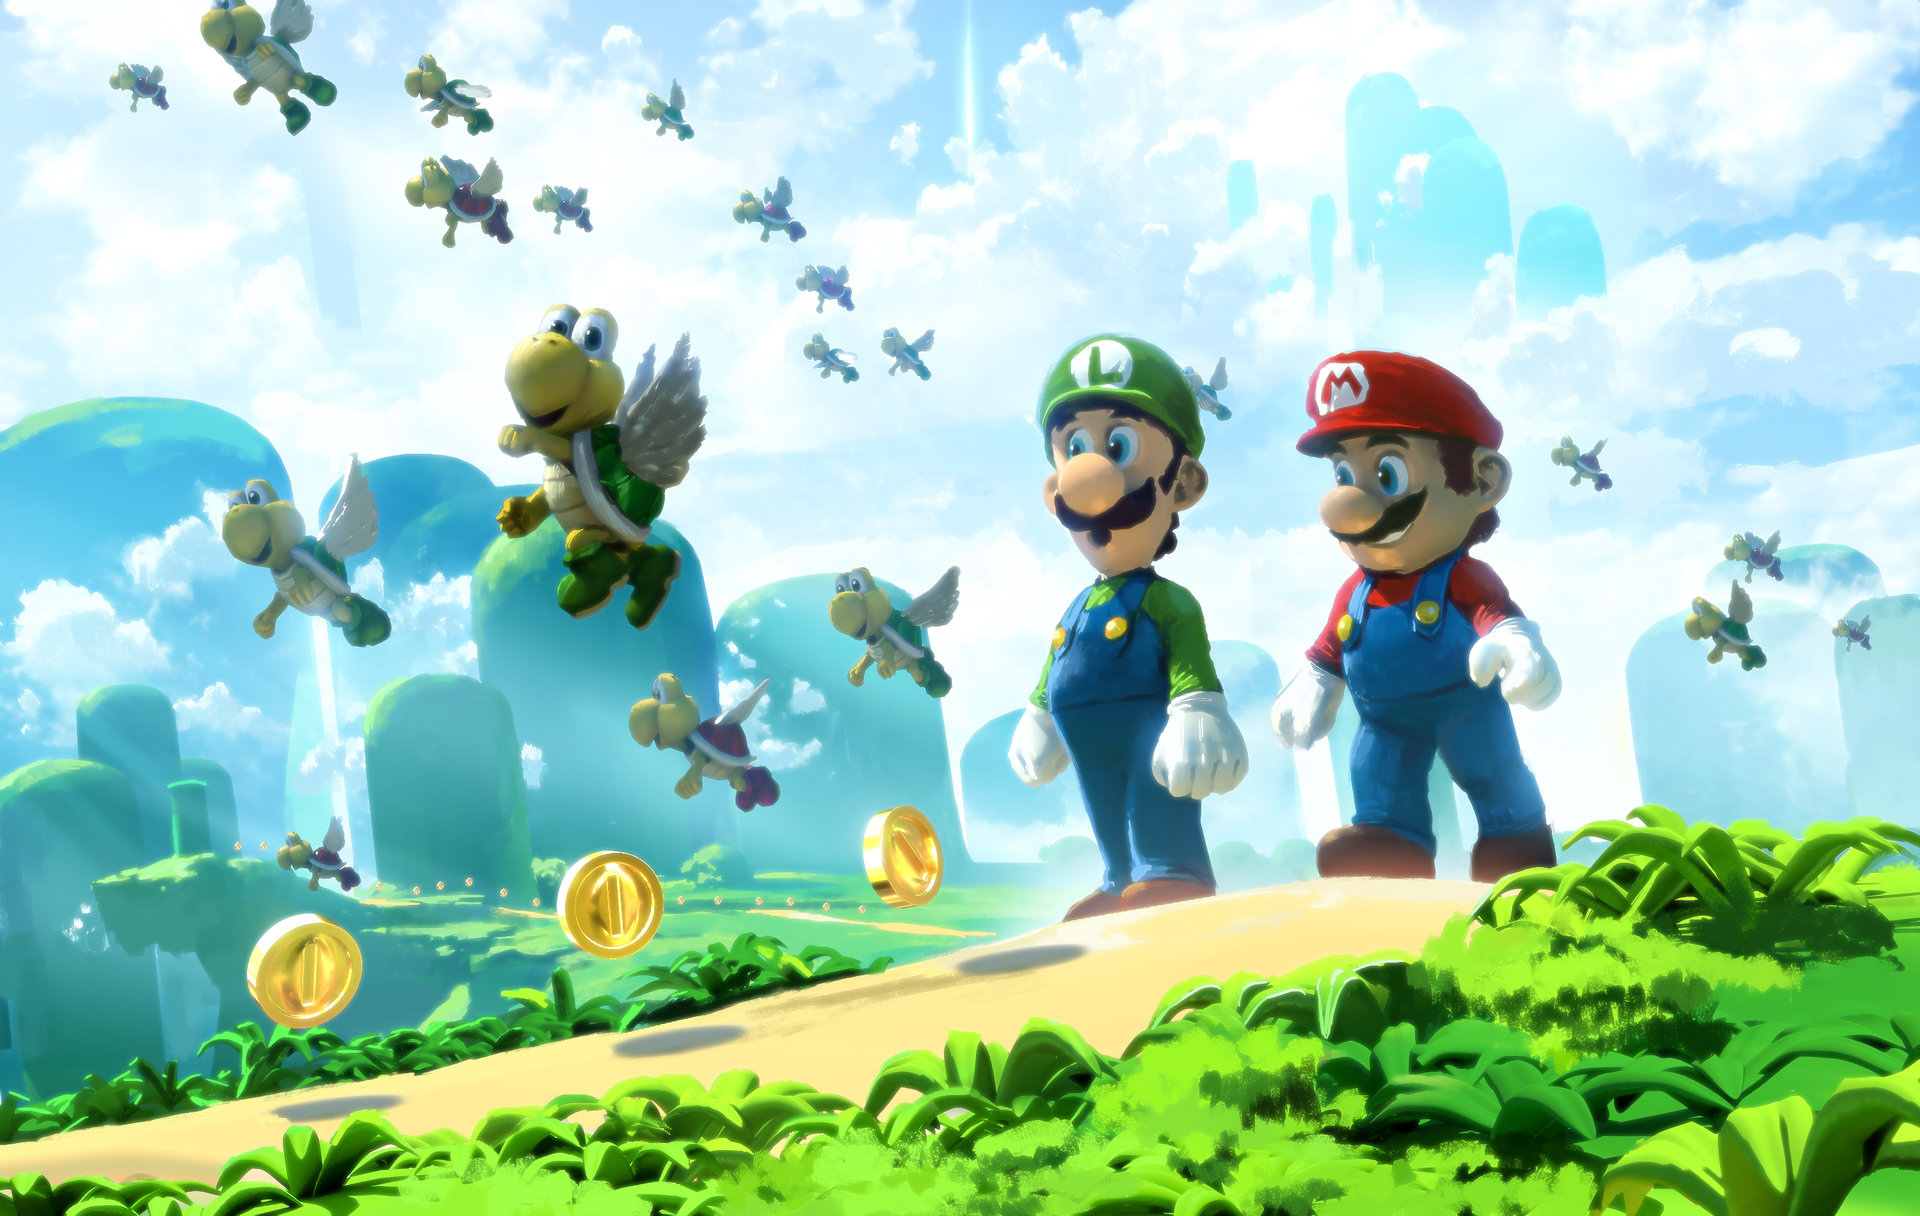 Fondos De Pantalla De Super Mario, Wallpapers